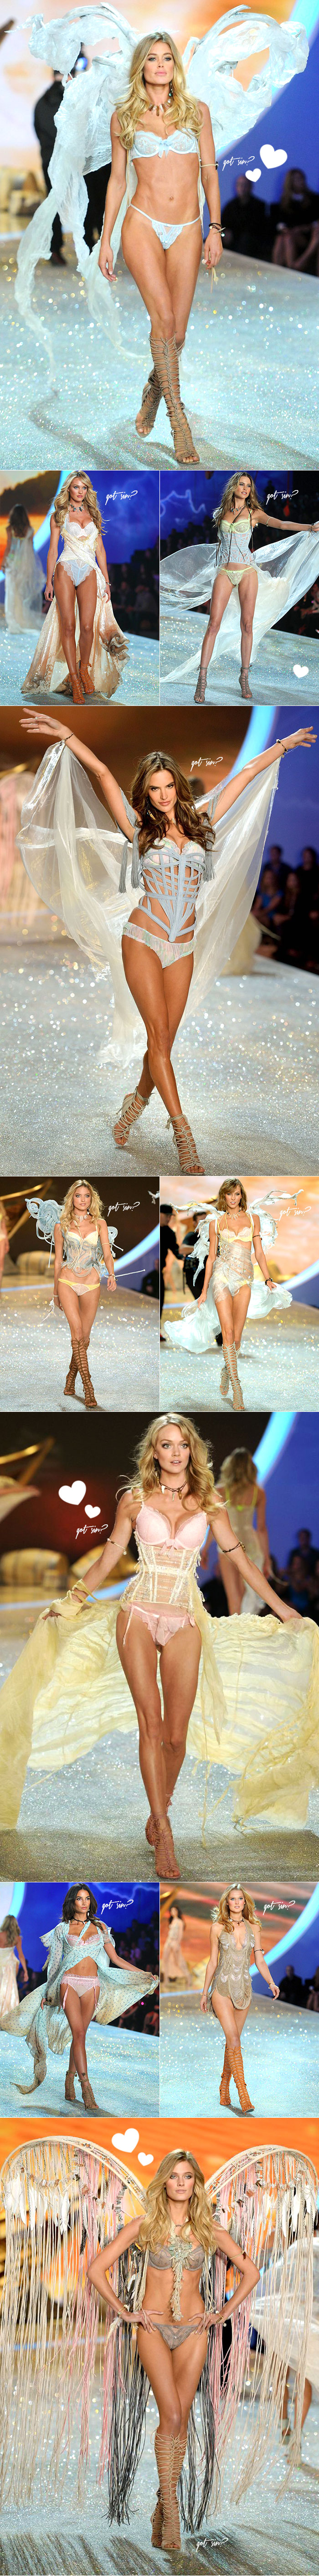 desfile-victorias-secret-fashion-show-blog-got-sin-alessandra-ambrosio-doutzen-kroes-candice-swanepoel-sexy-lingerie-01